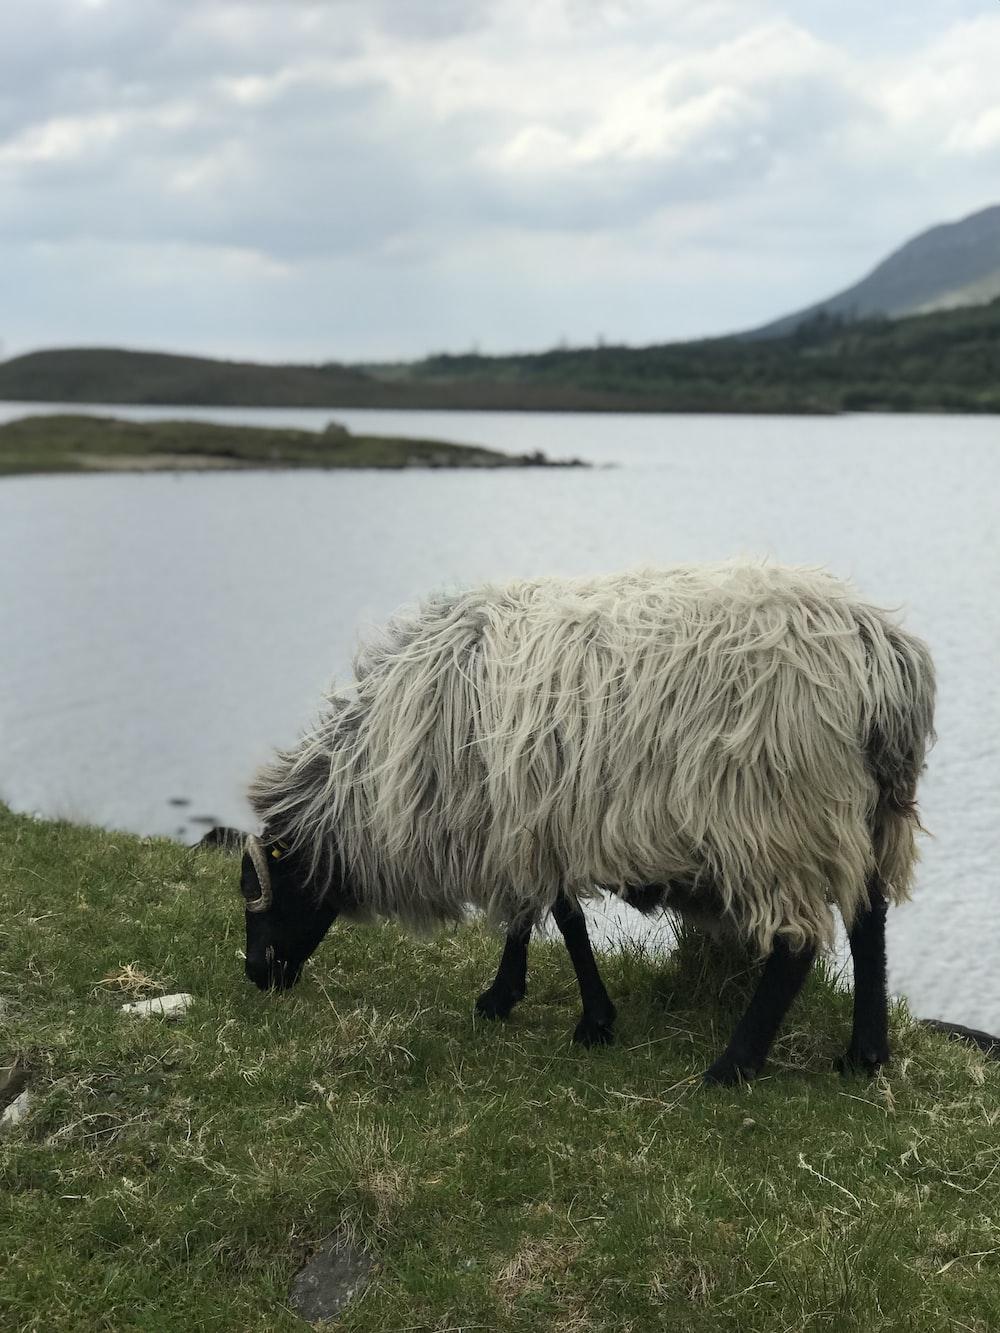 white and black sheep eating grass beside lake